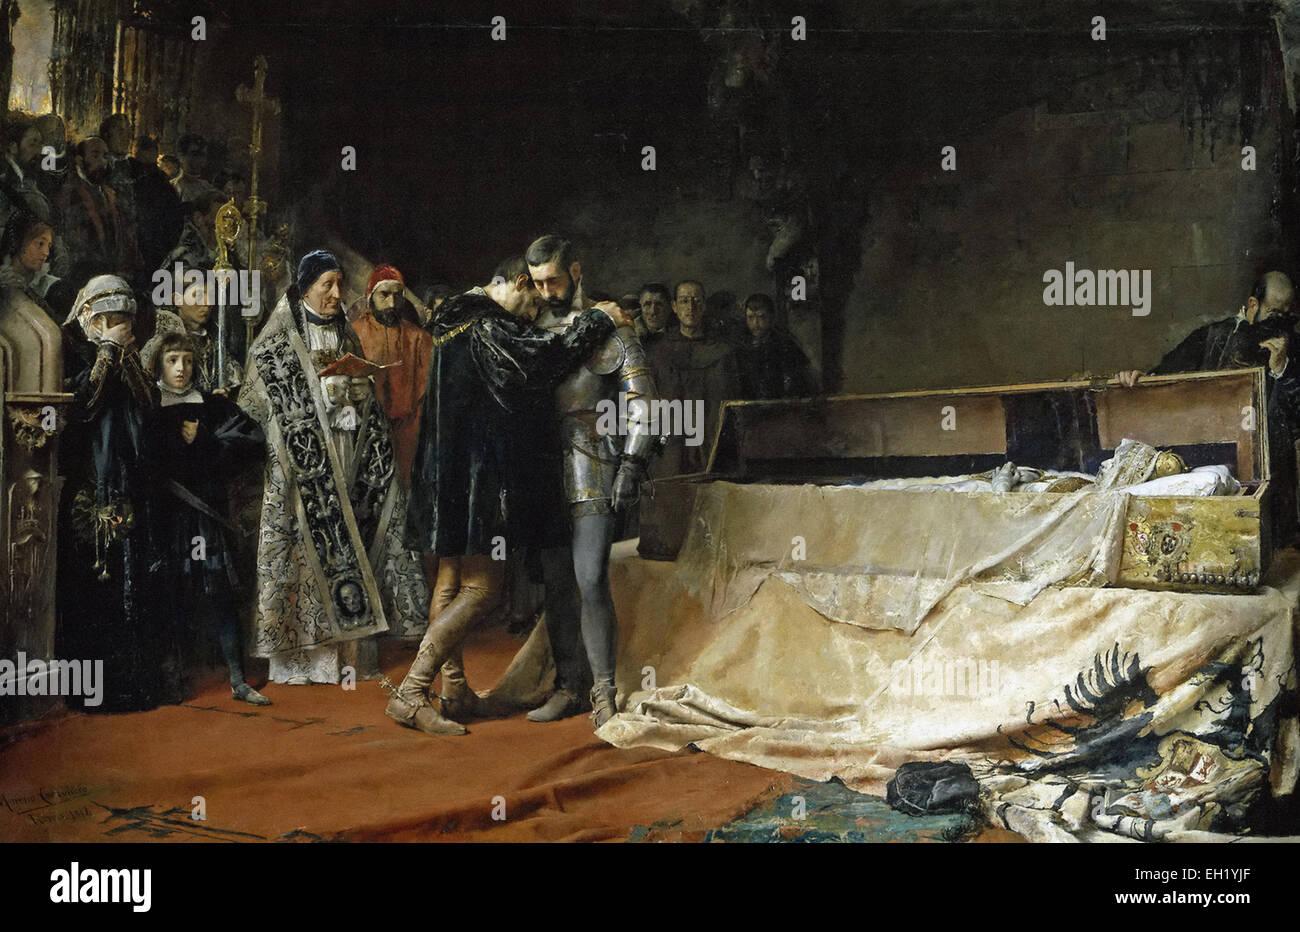 José Moreno Carbonero  The Conversion of the Duke of Gandia - Stock Image